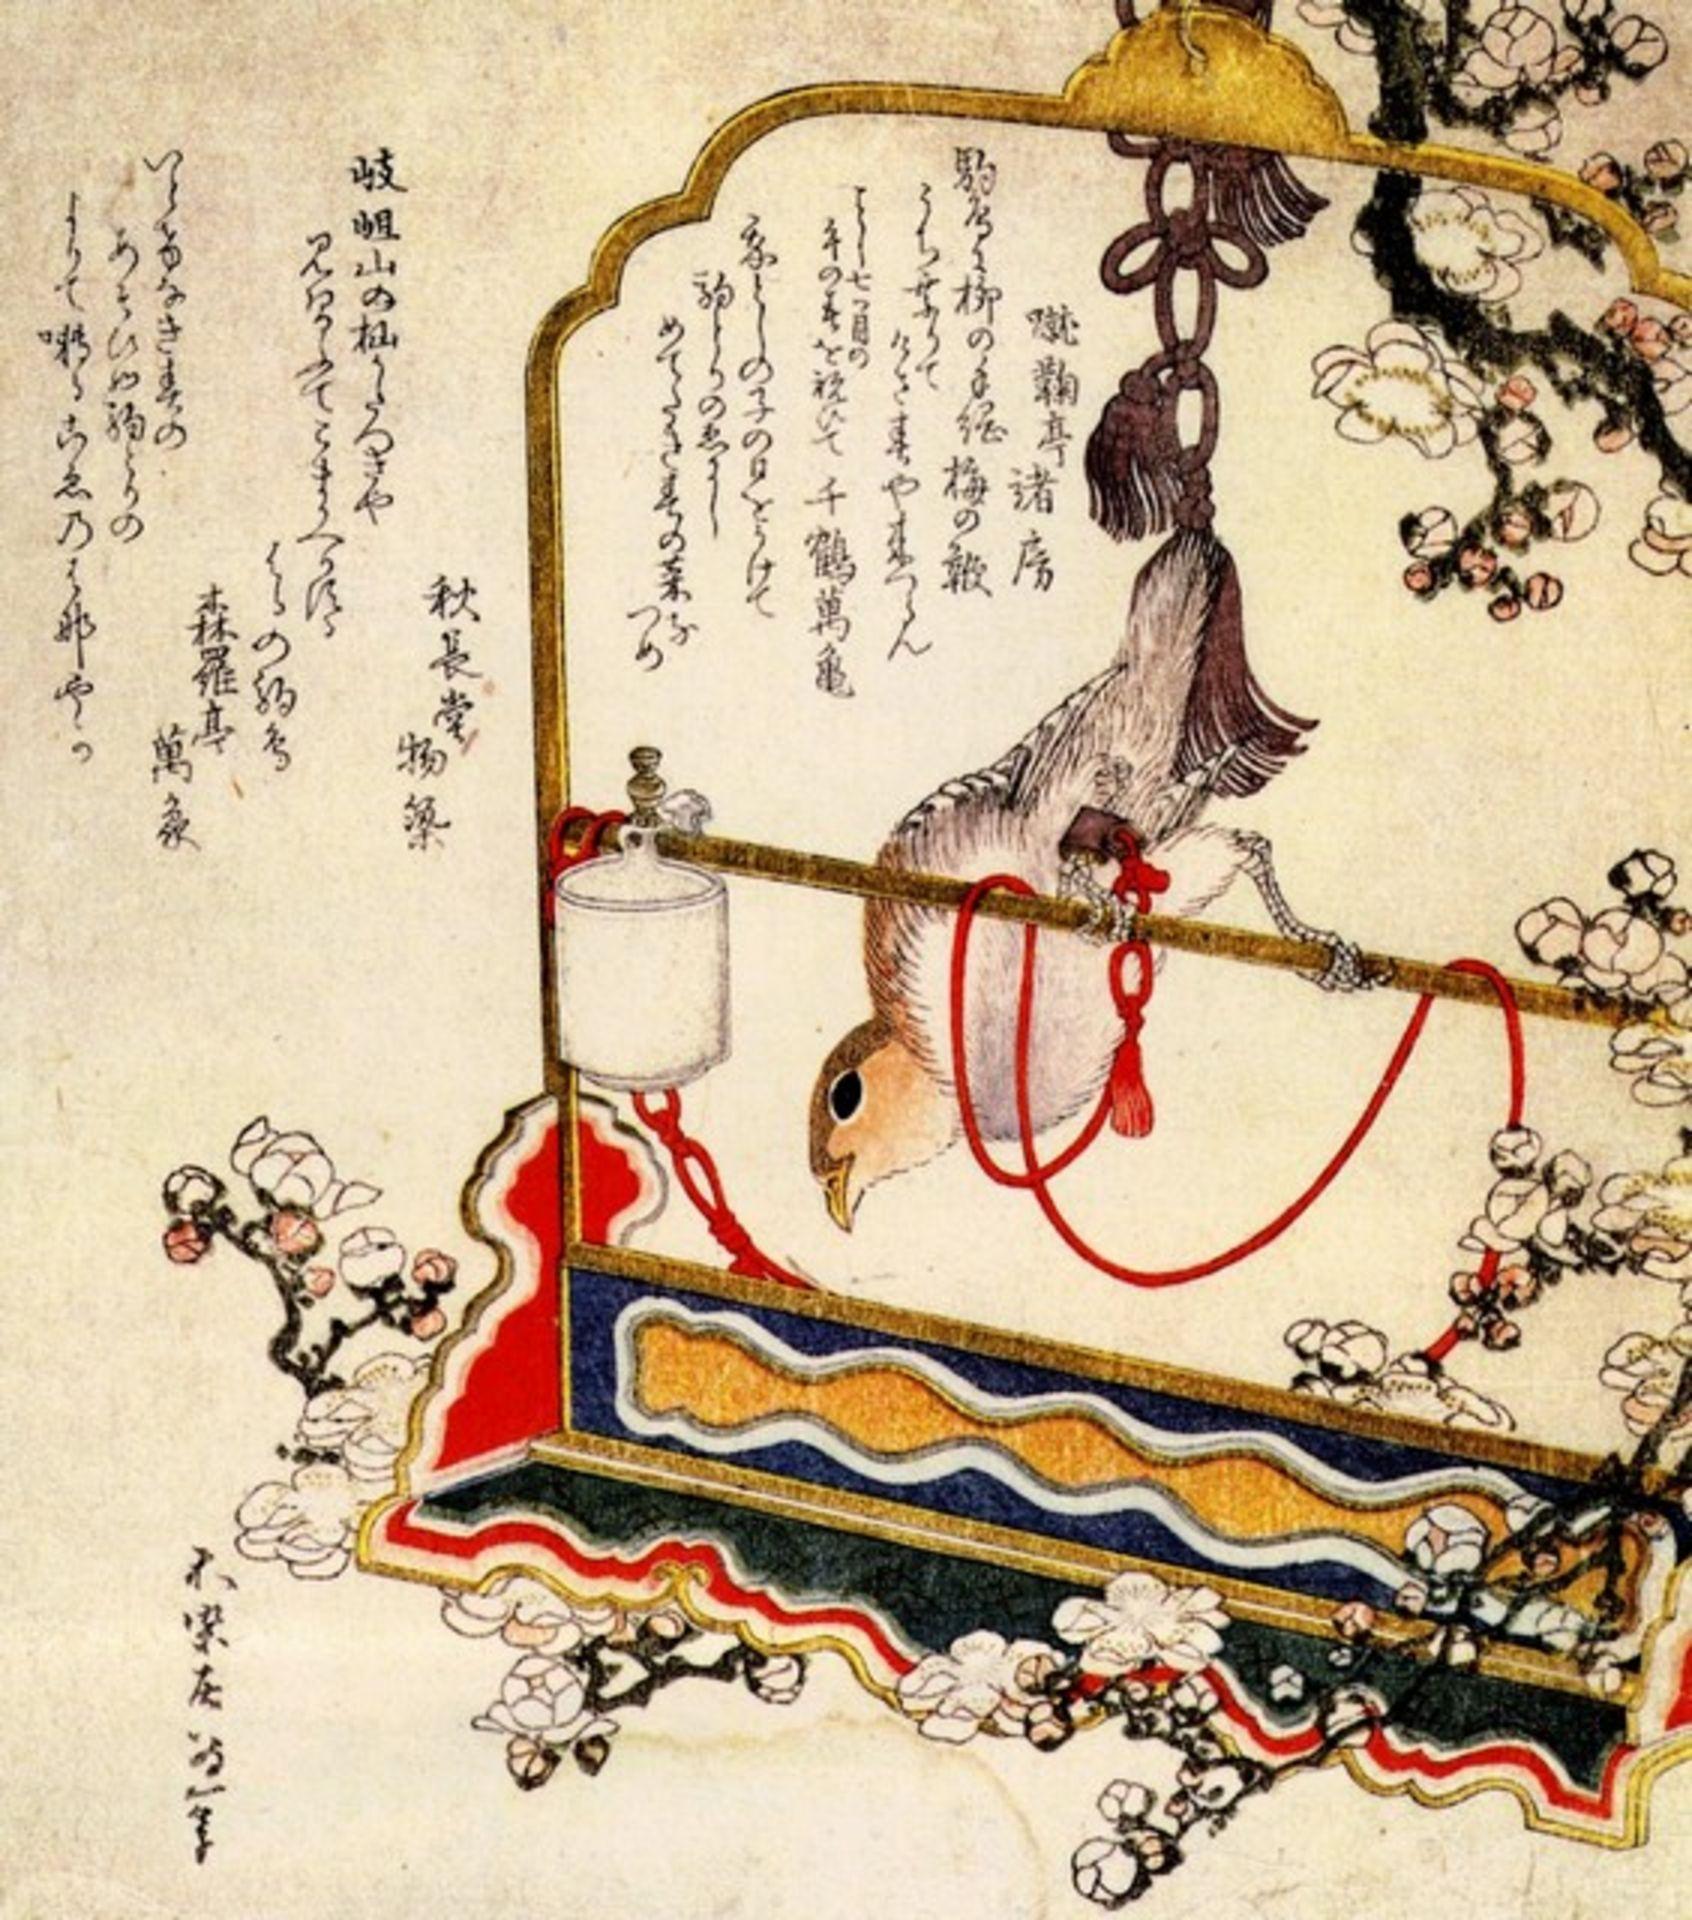 Hokusai - A Robin as a Present